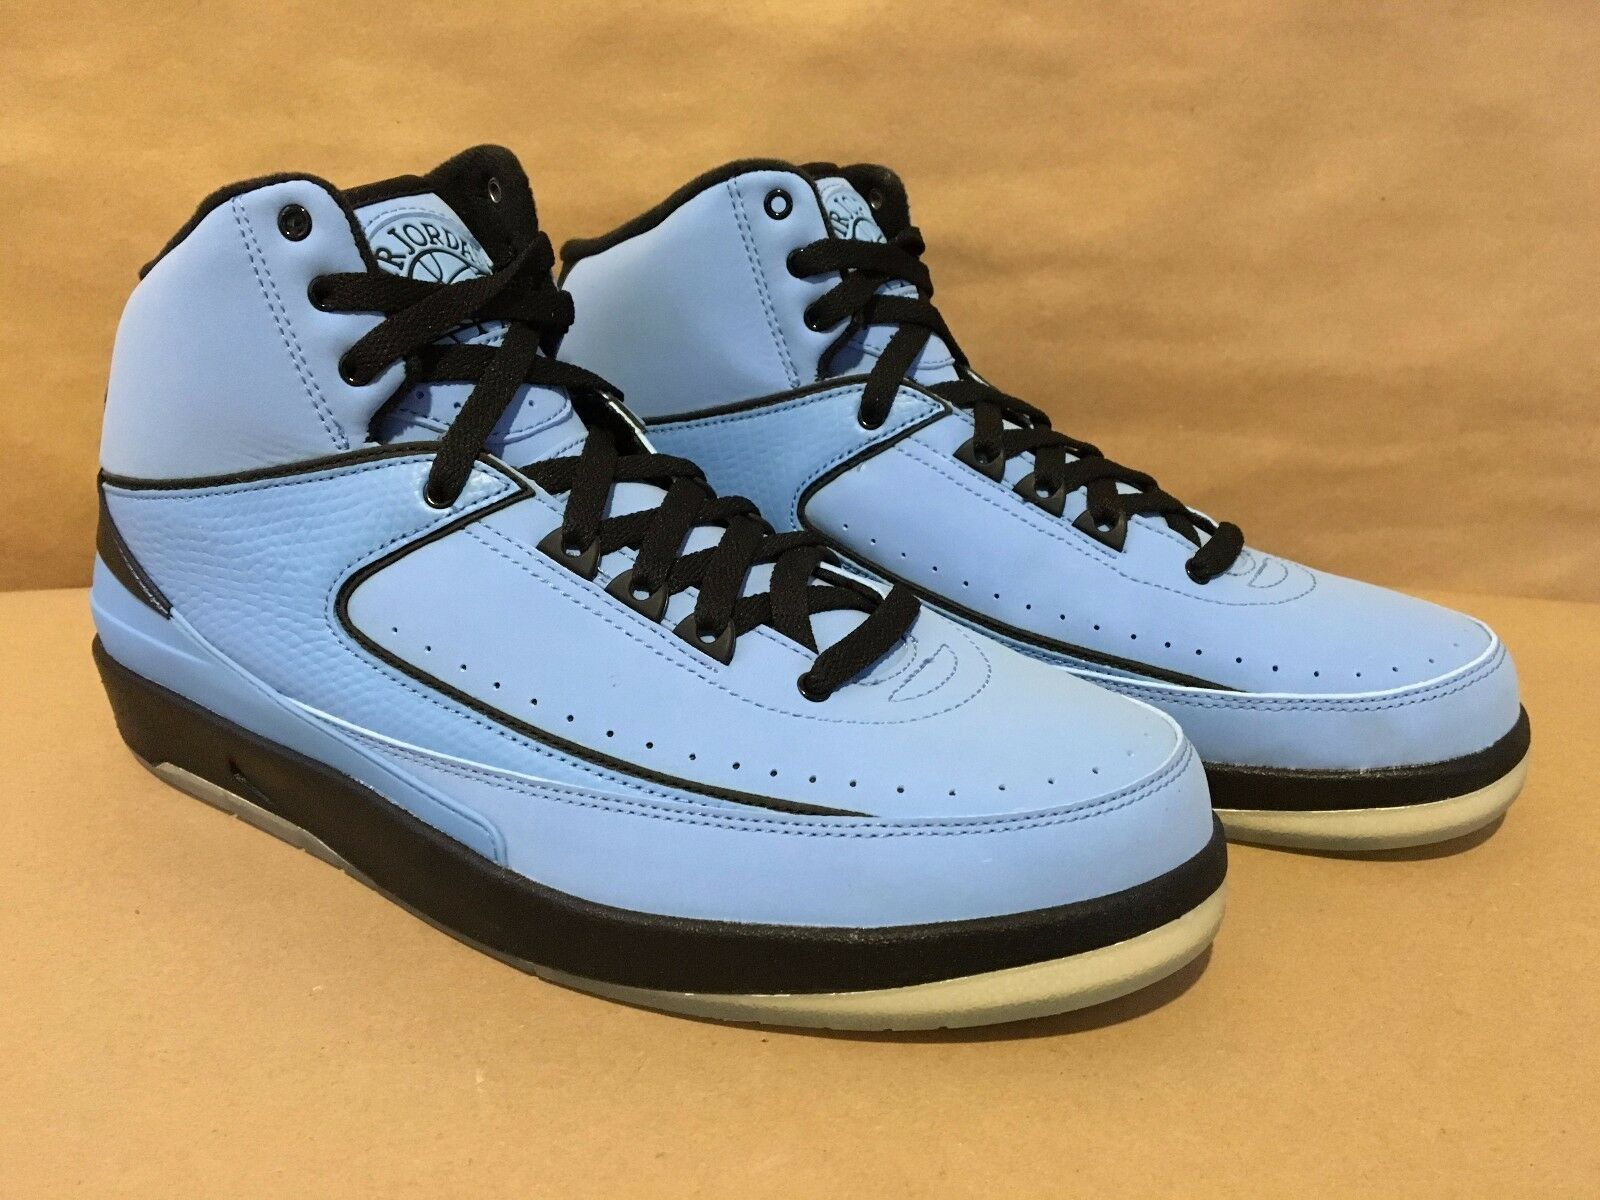 395709-401 Air Jordan 2 Retro QF Univ. bluee Black-White Size 10.5 (2010) DS